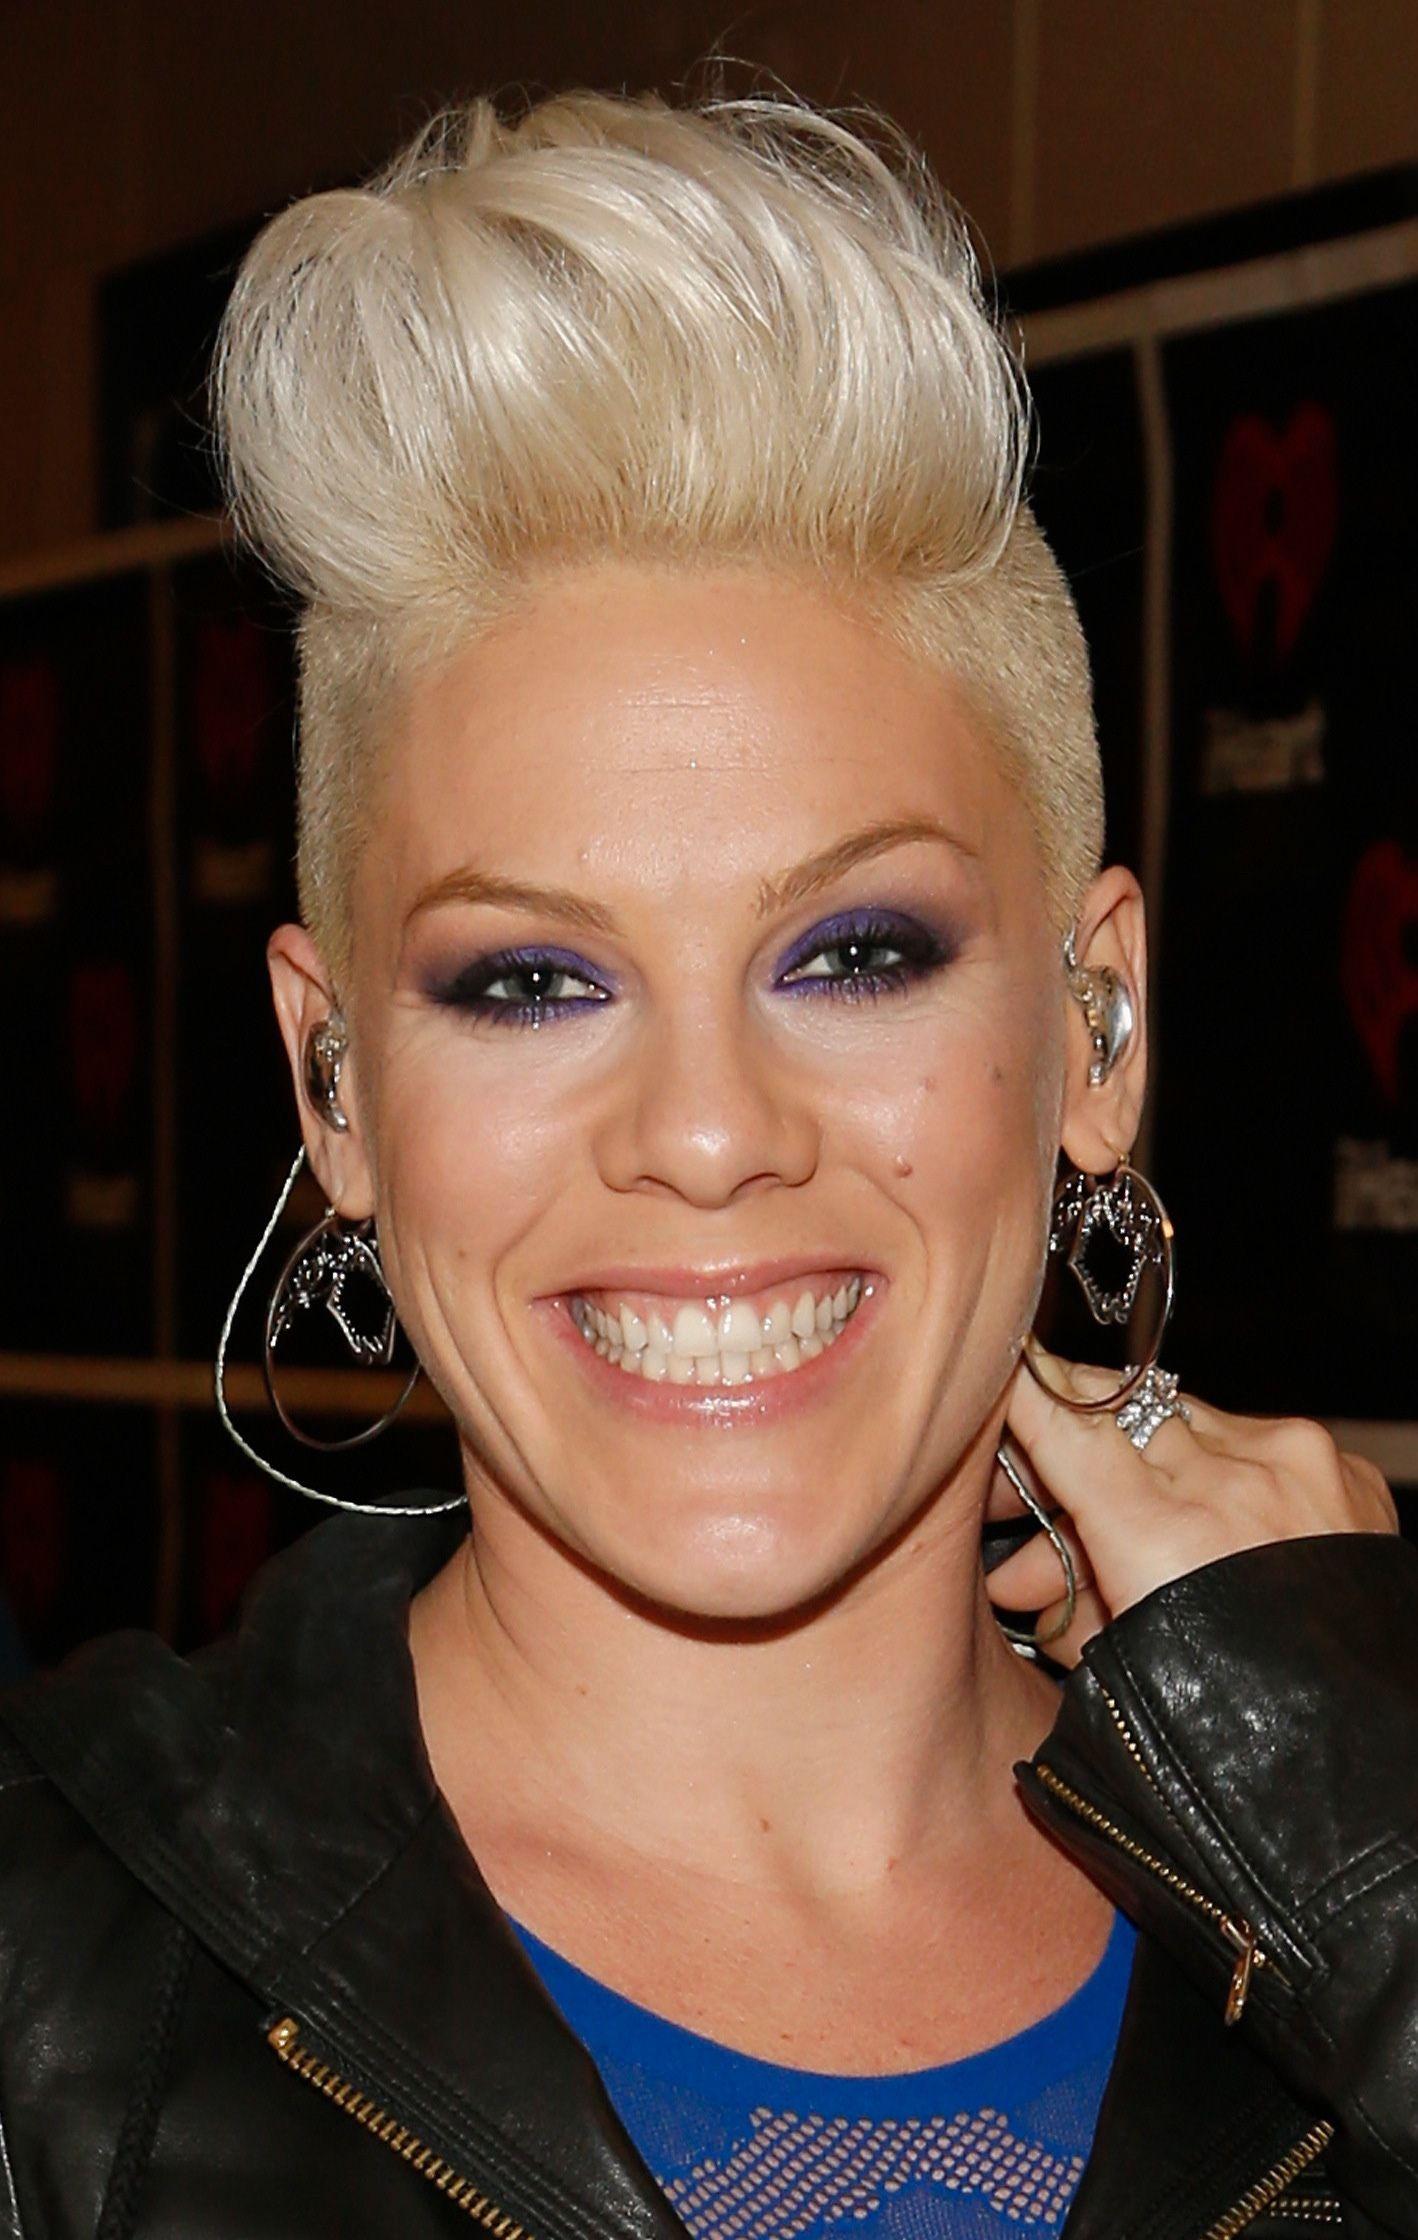 Singer Pink Hairstyles on Pinterest